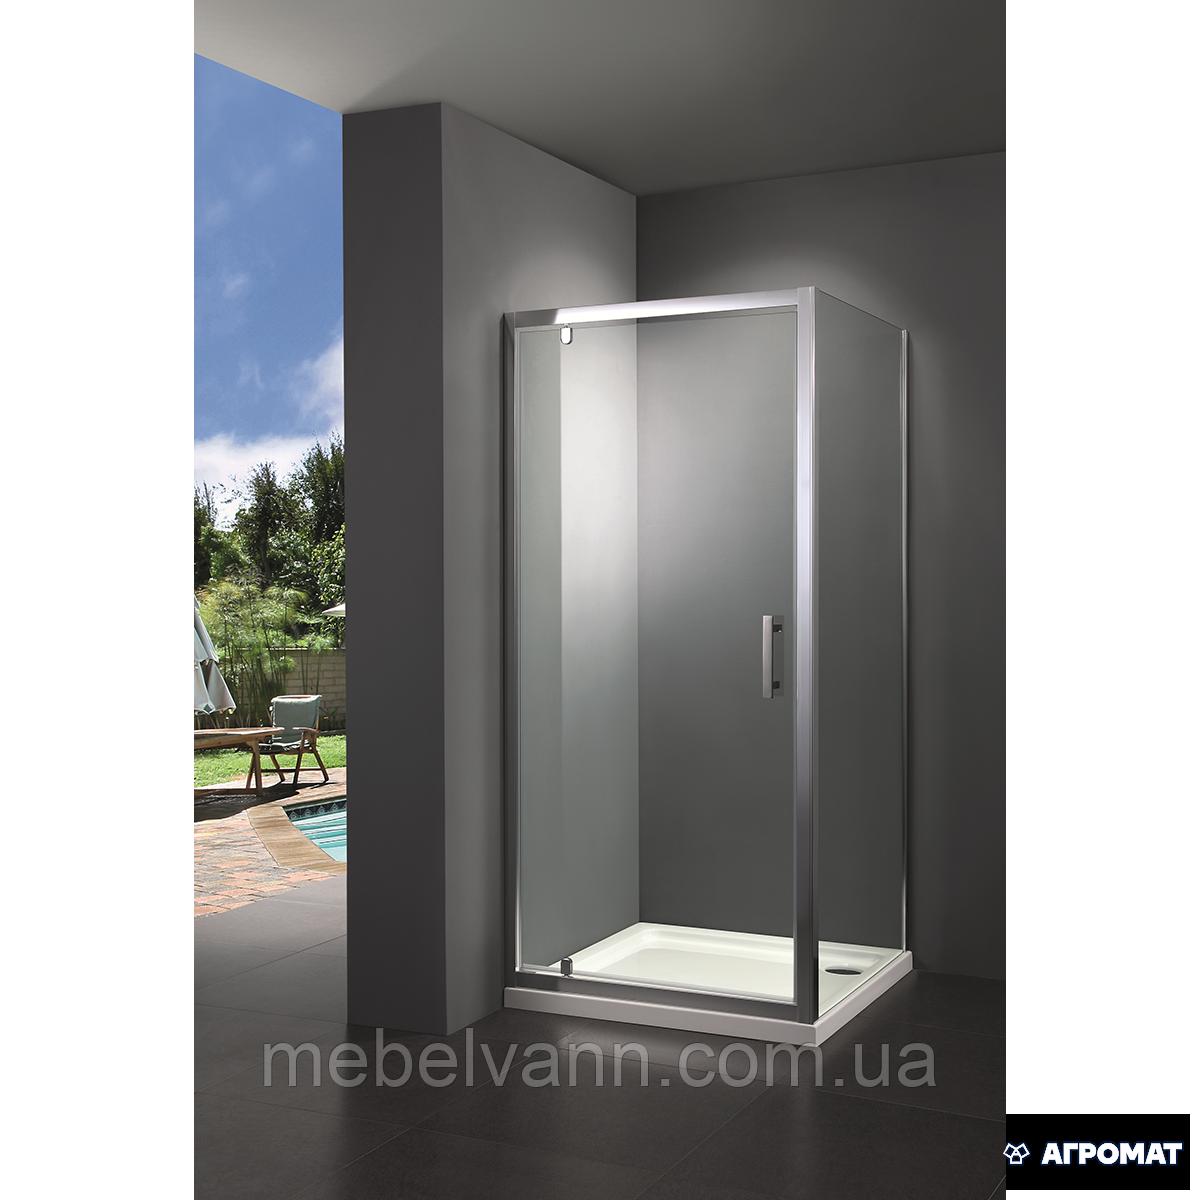 Душевая дверь PRIMERA Frame SHRP56106,матовое рефленное